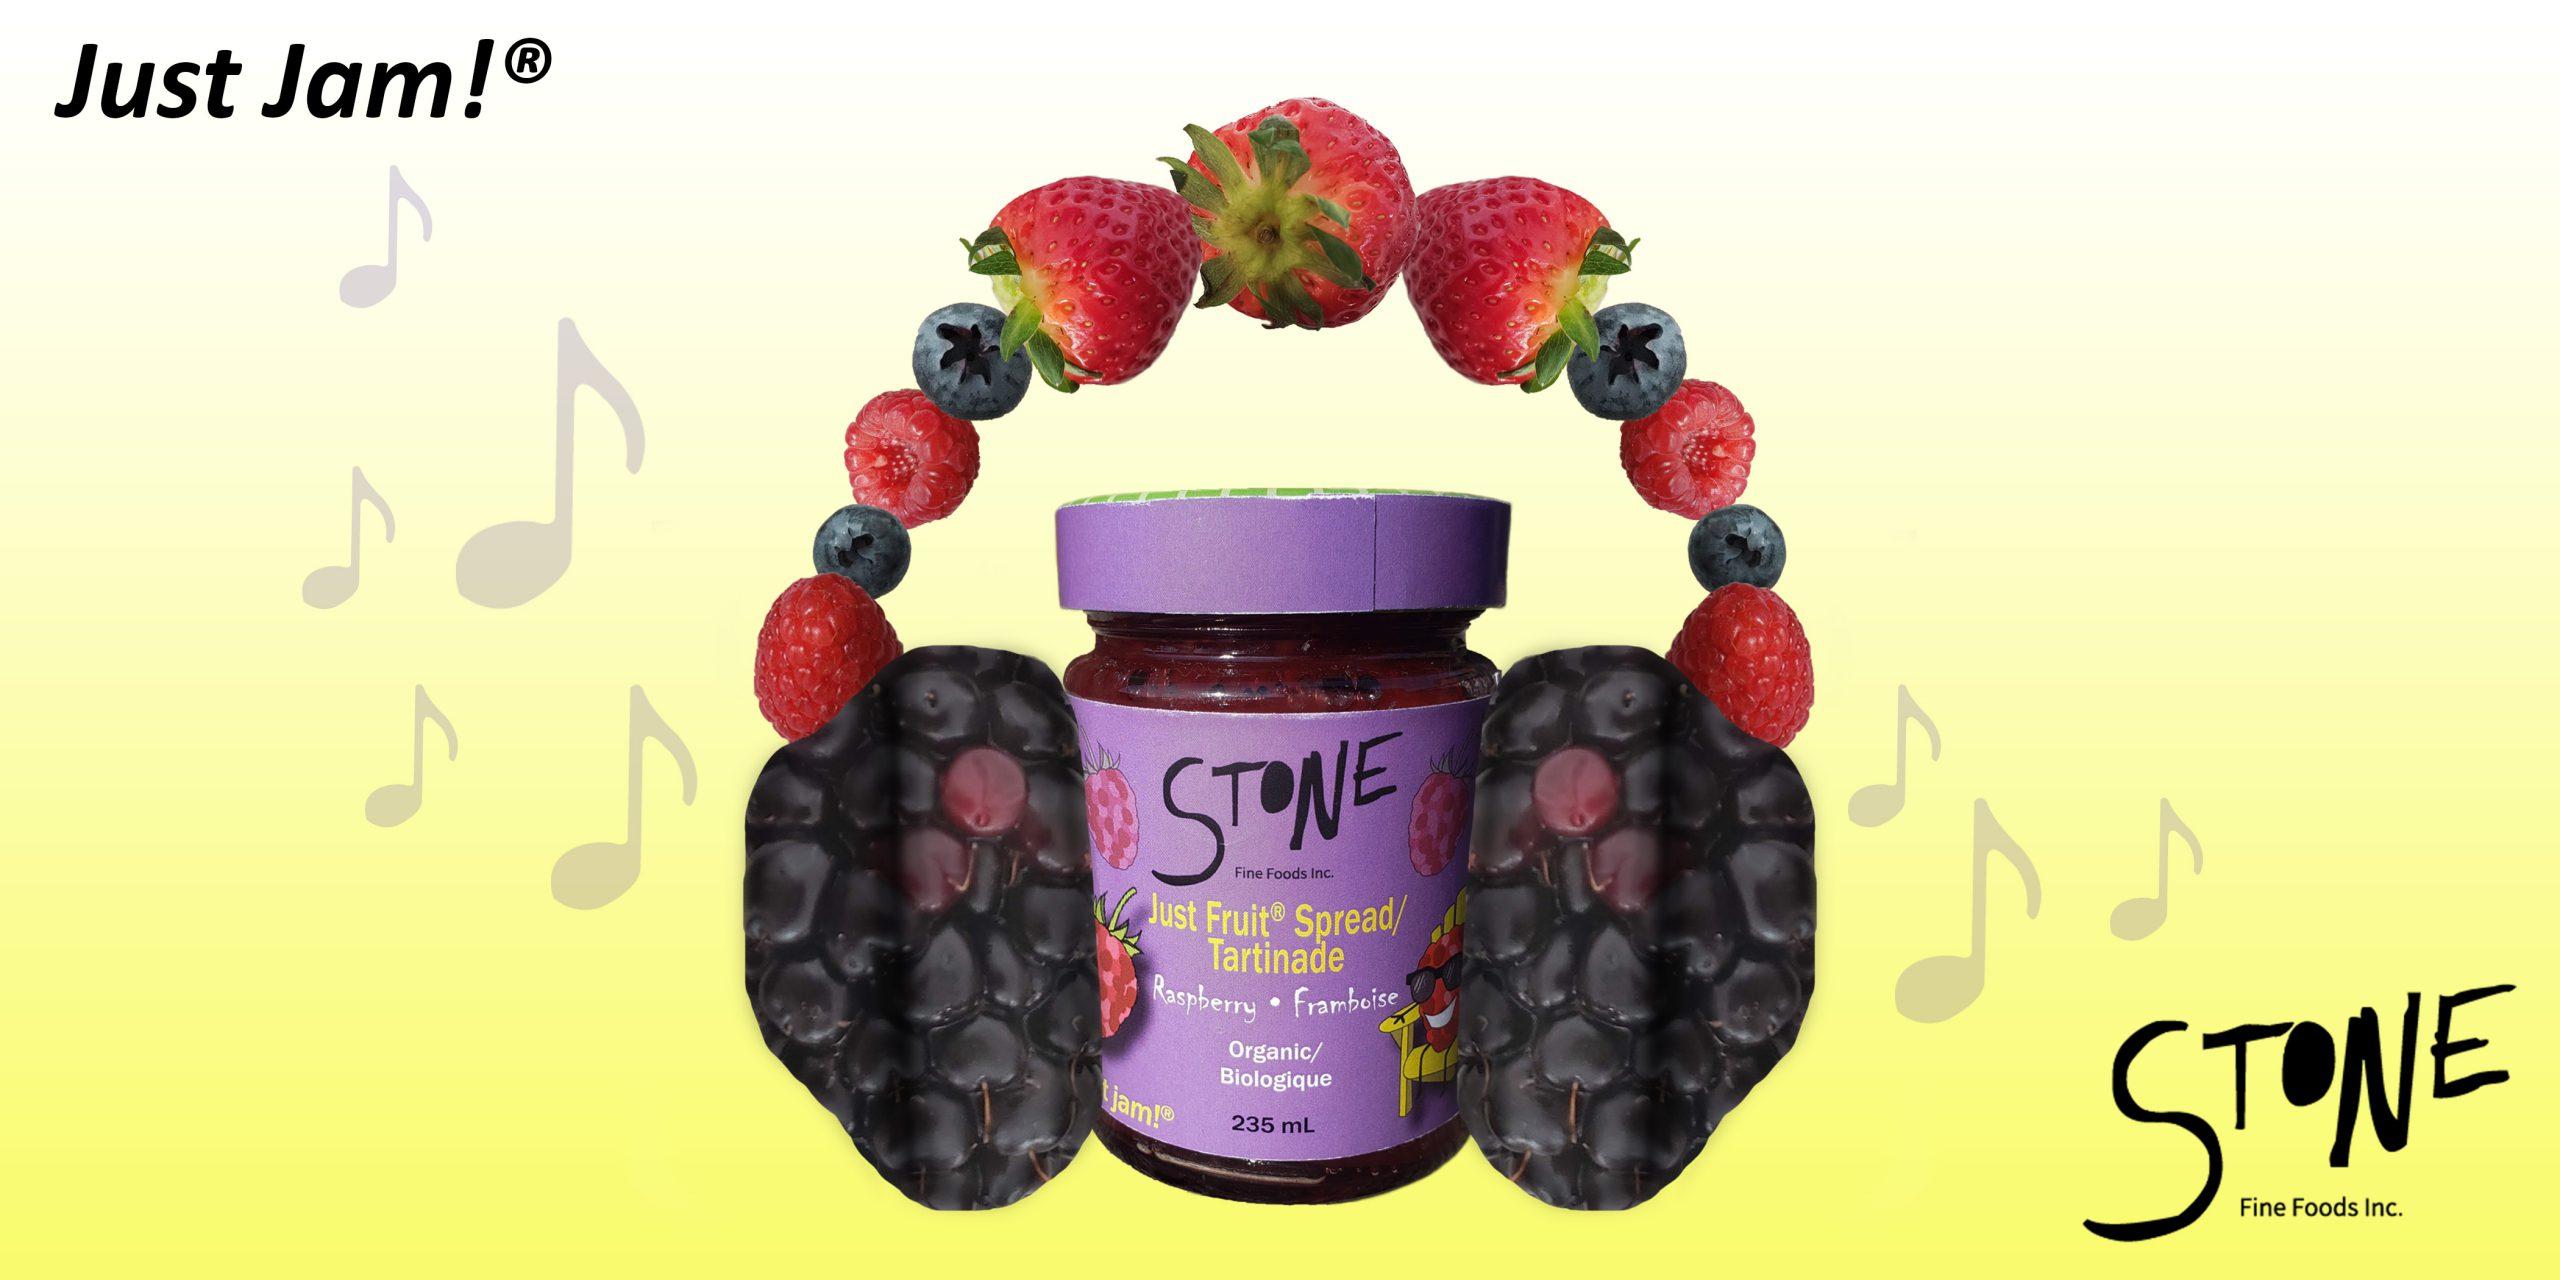 Billboard advertisement for Stone fruit spread